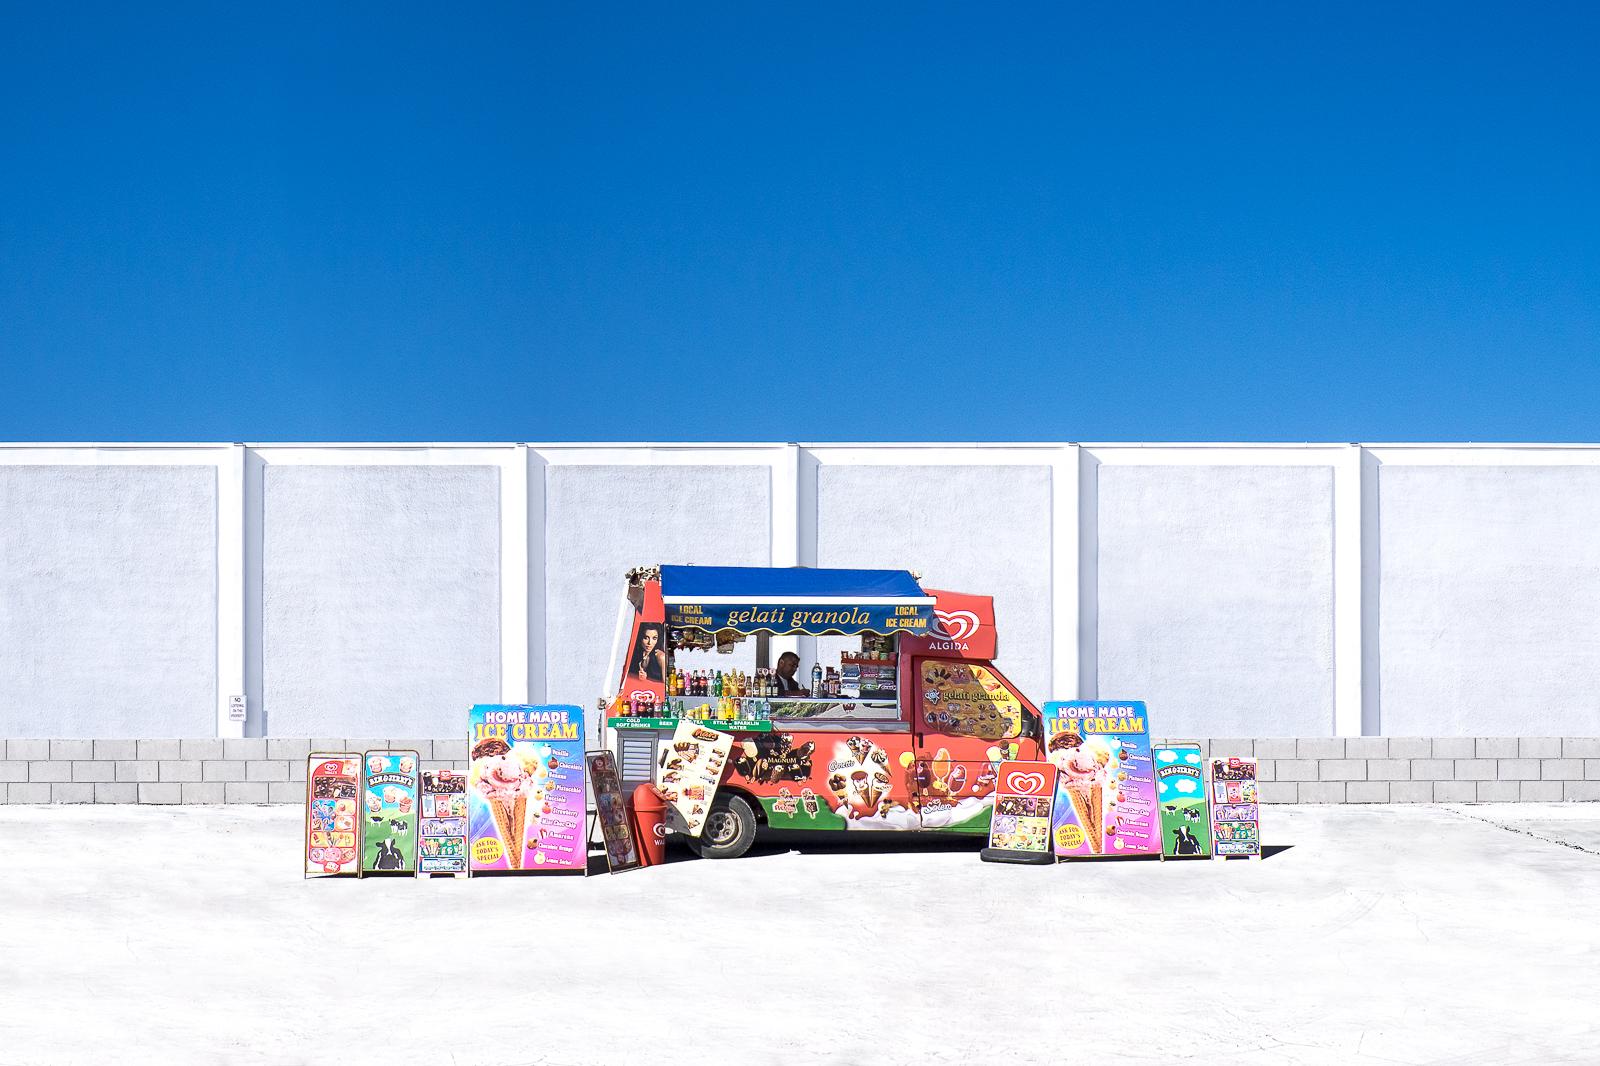 Paul-Melo-Photography-Prints-Ice Cream In Gozo.jpg